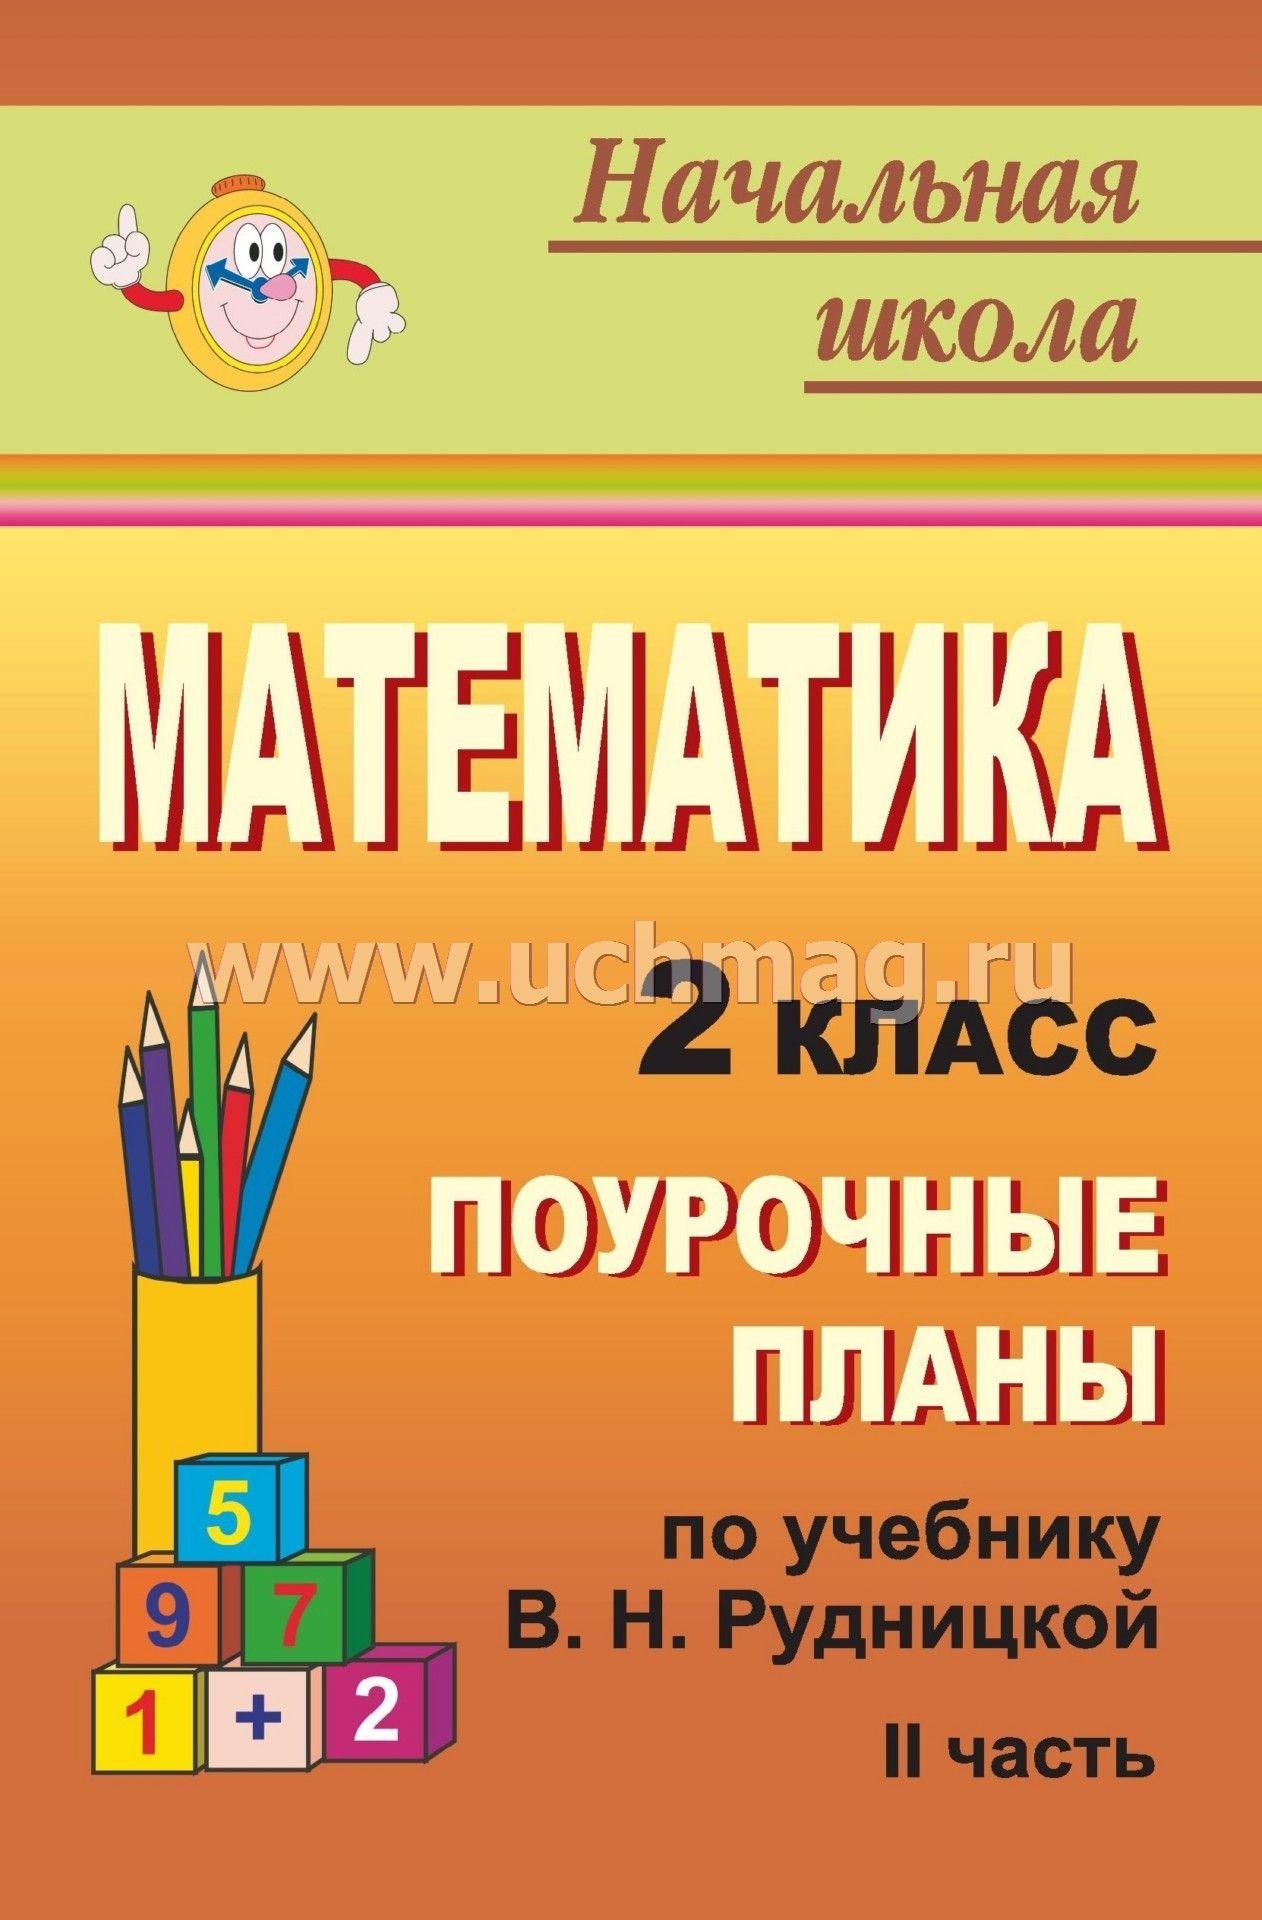 Начальная Школа Xxi Века 4 Класс Решебник По Математике